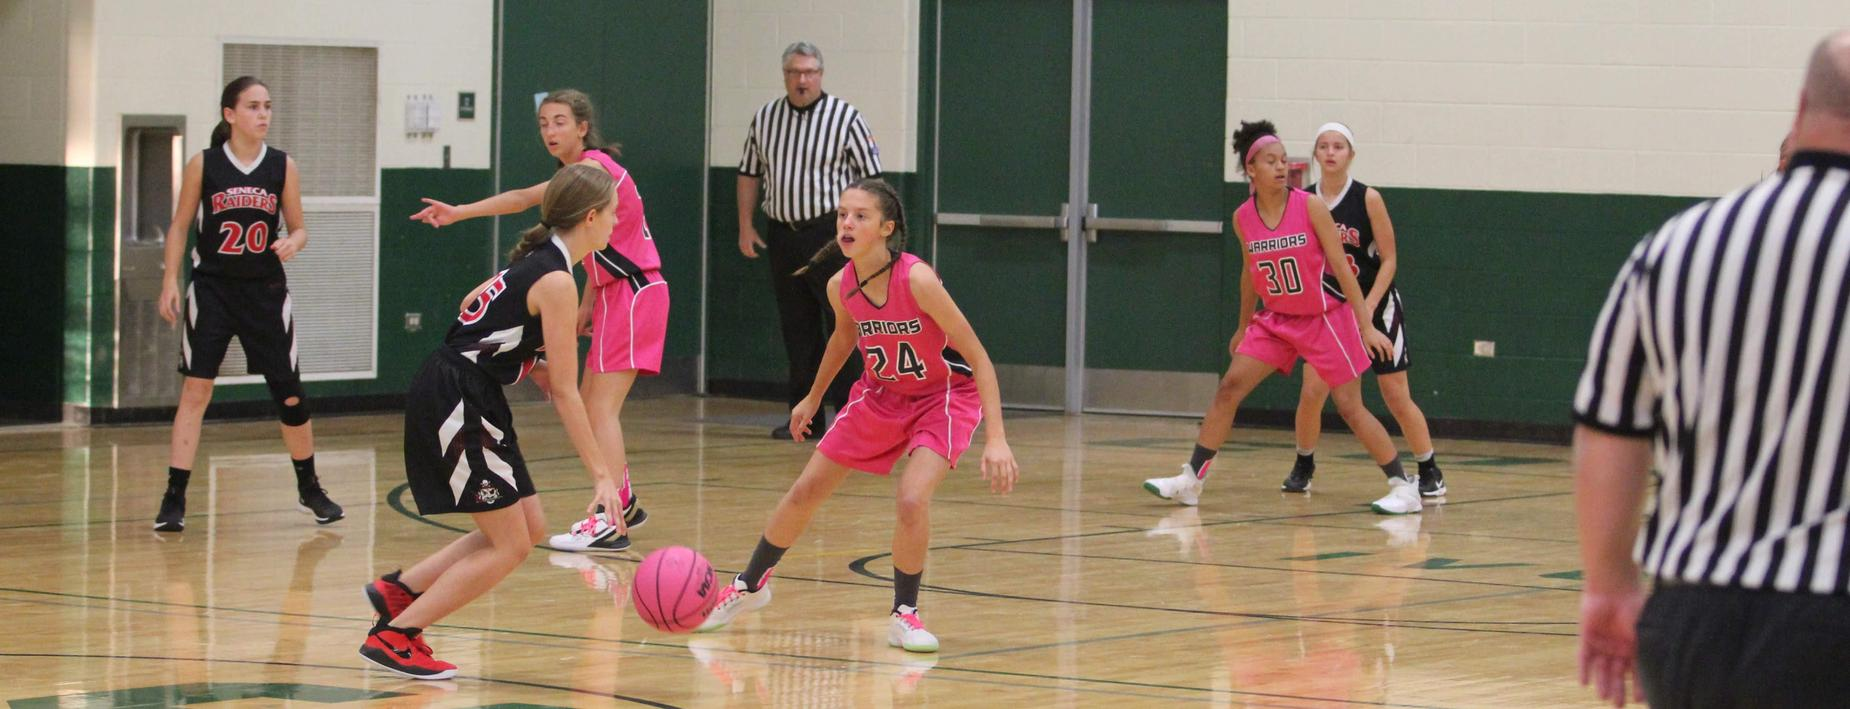 Girls Basketball CCMS